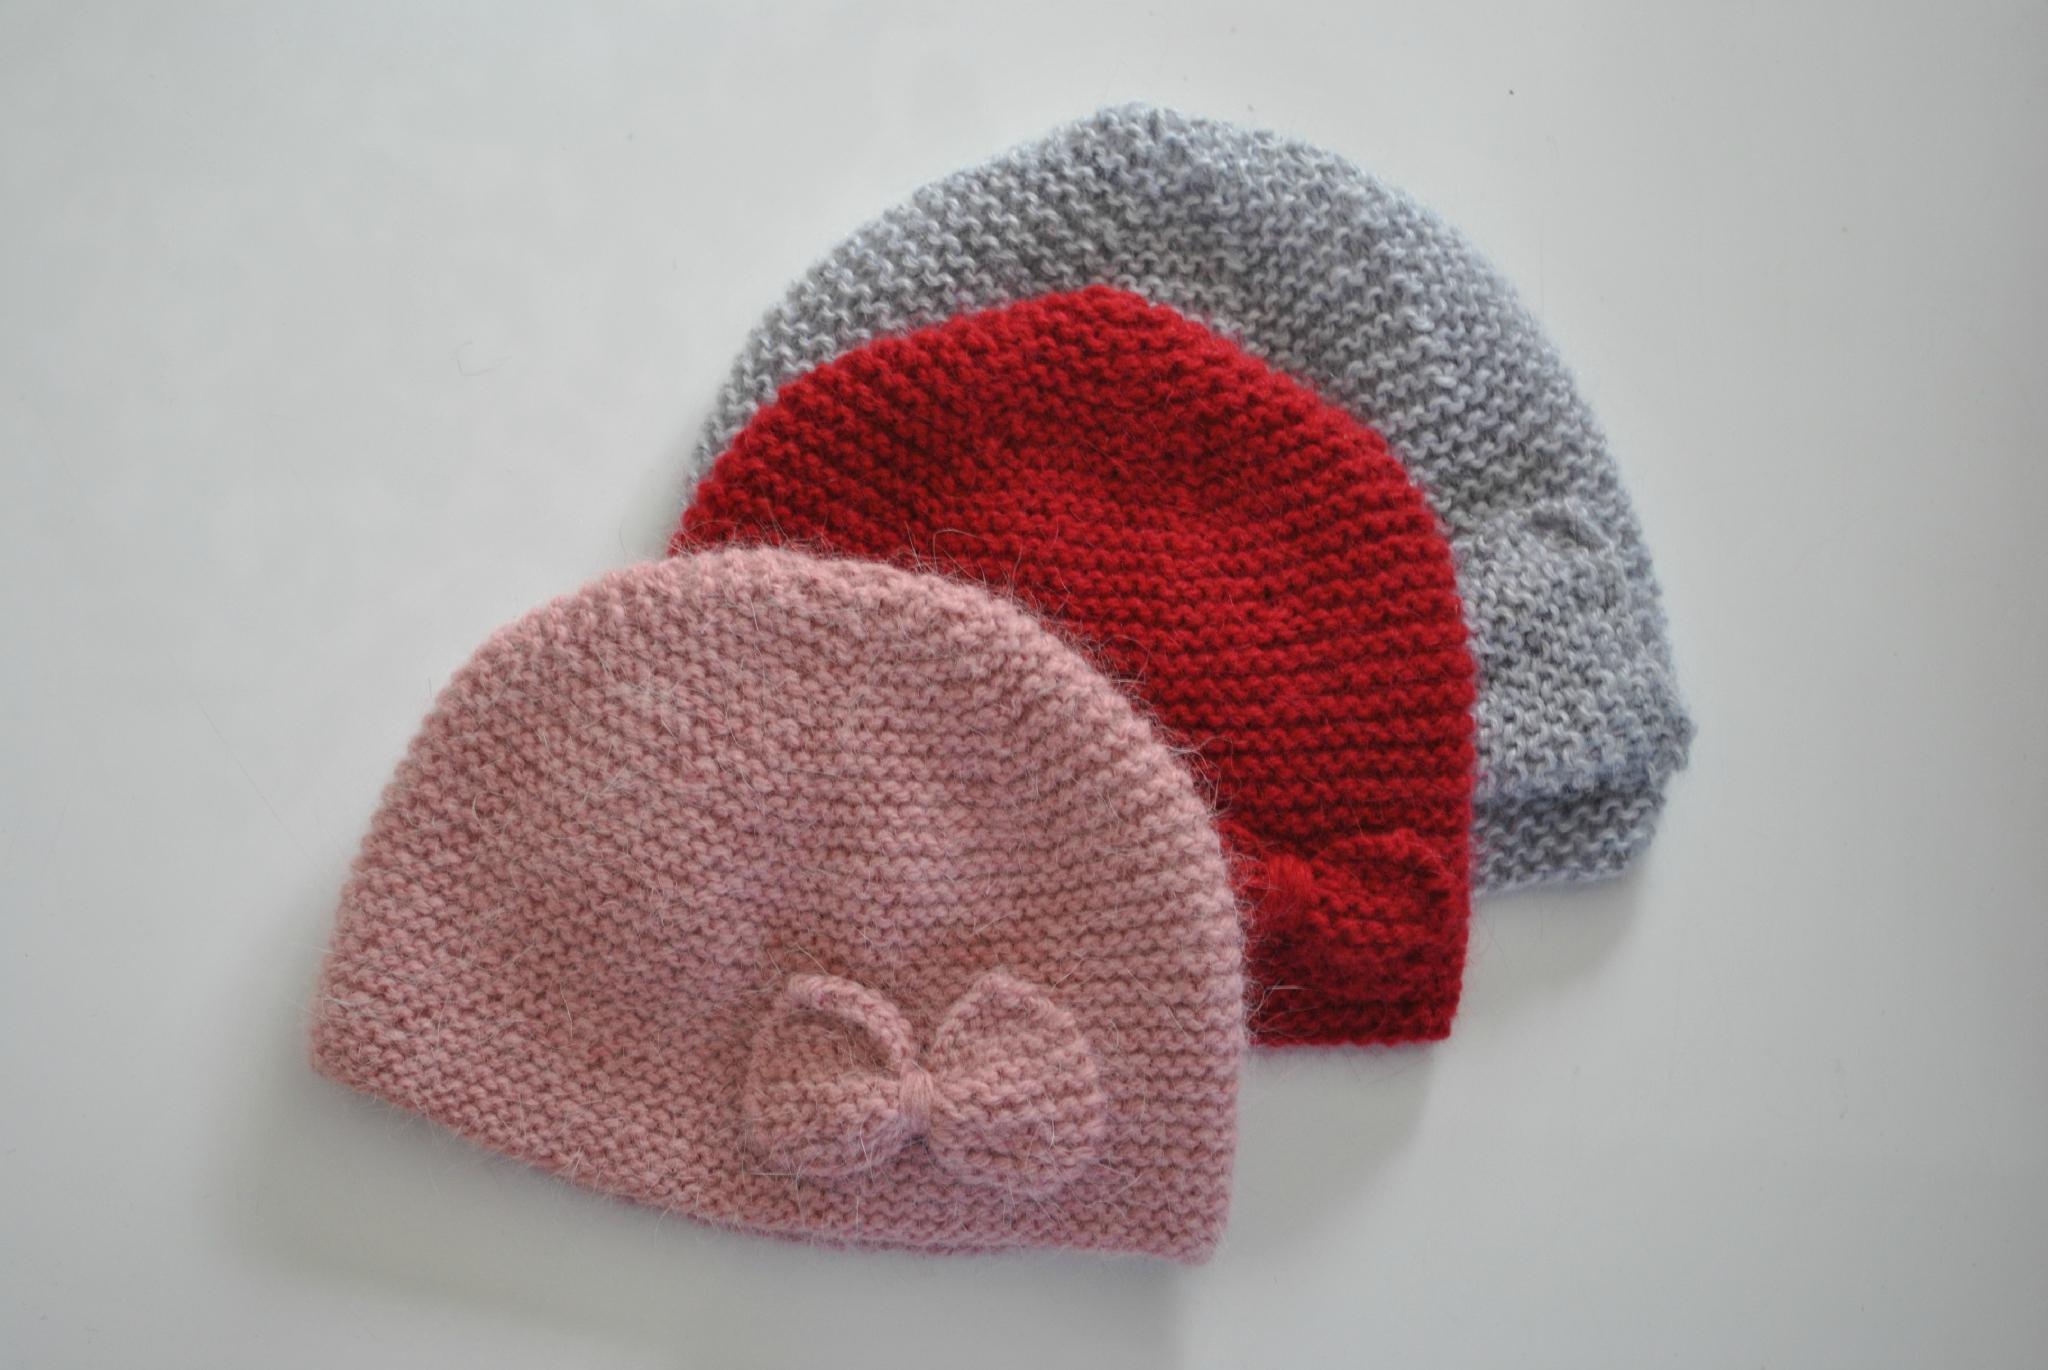 Mod le bonnet tricot b b 18 mois - Bebe 18 mois ...